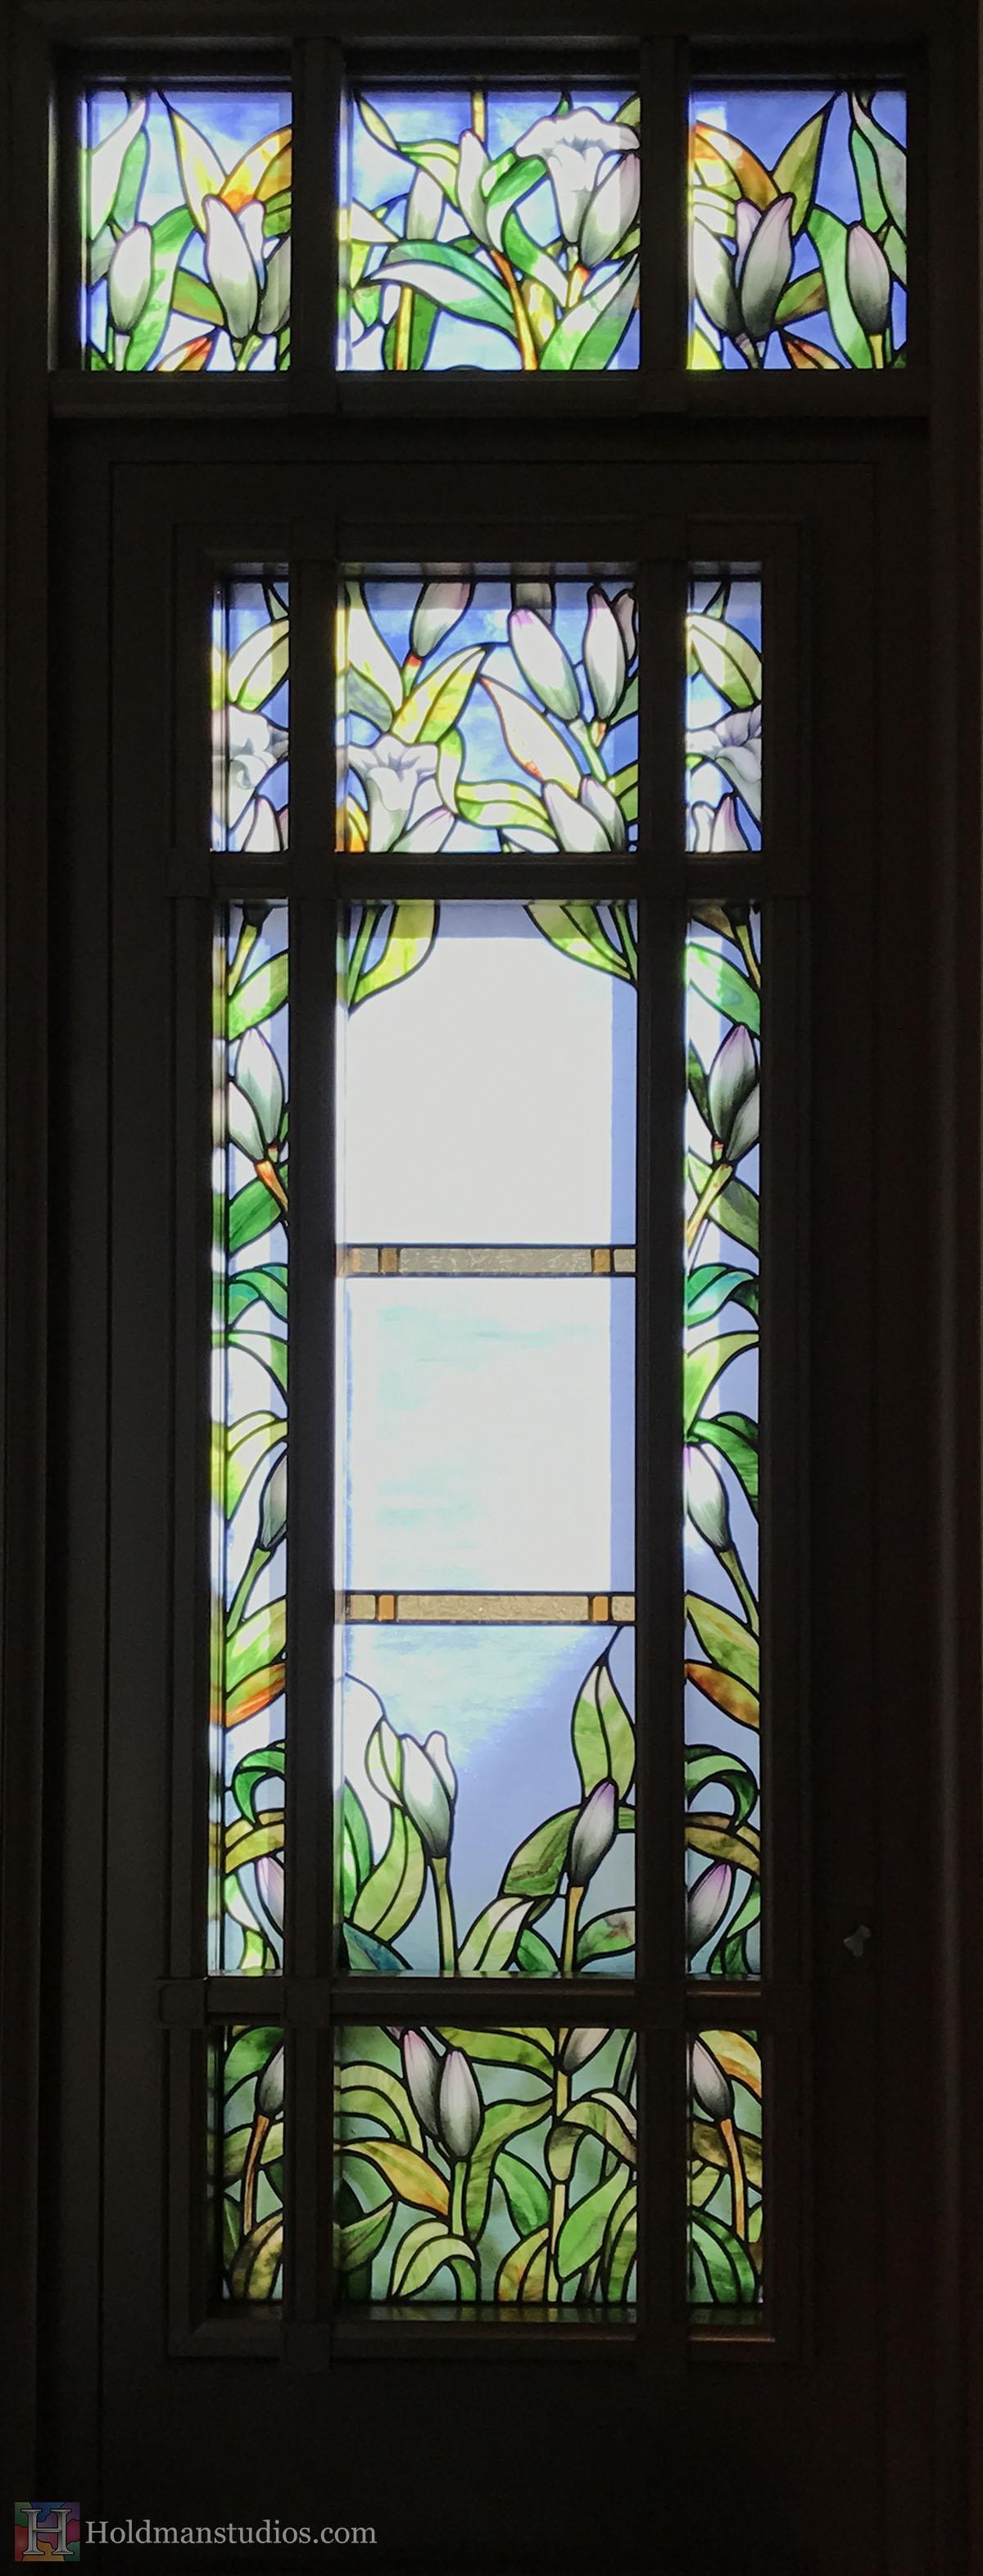 Holdman-Studios-Stained-Glass-Paris-LDS-Temple-Madonna-Lily-Flowers-Leaves-Door-Windows.jpg